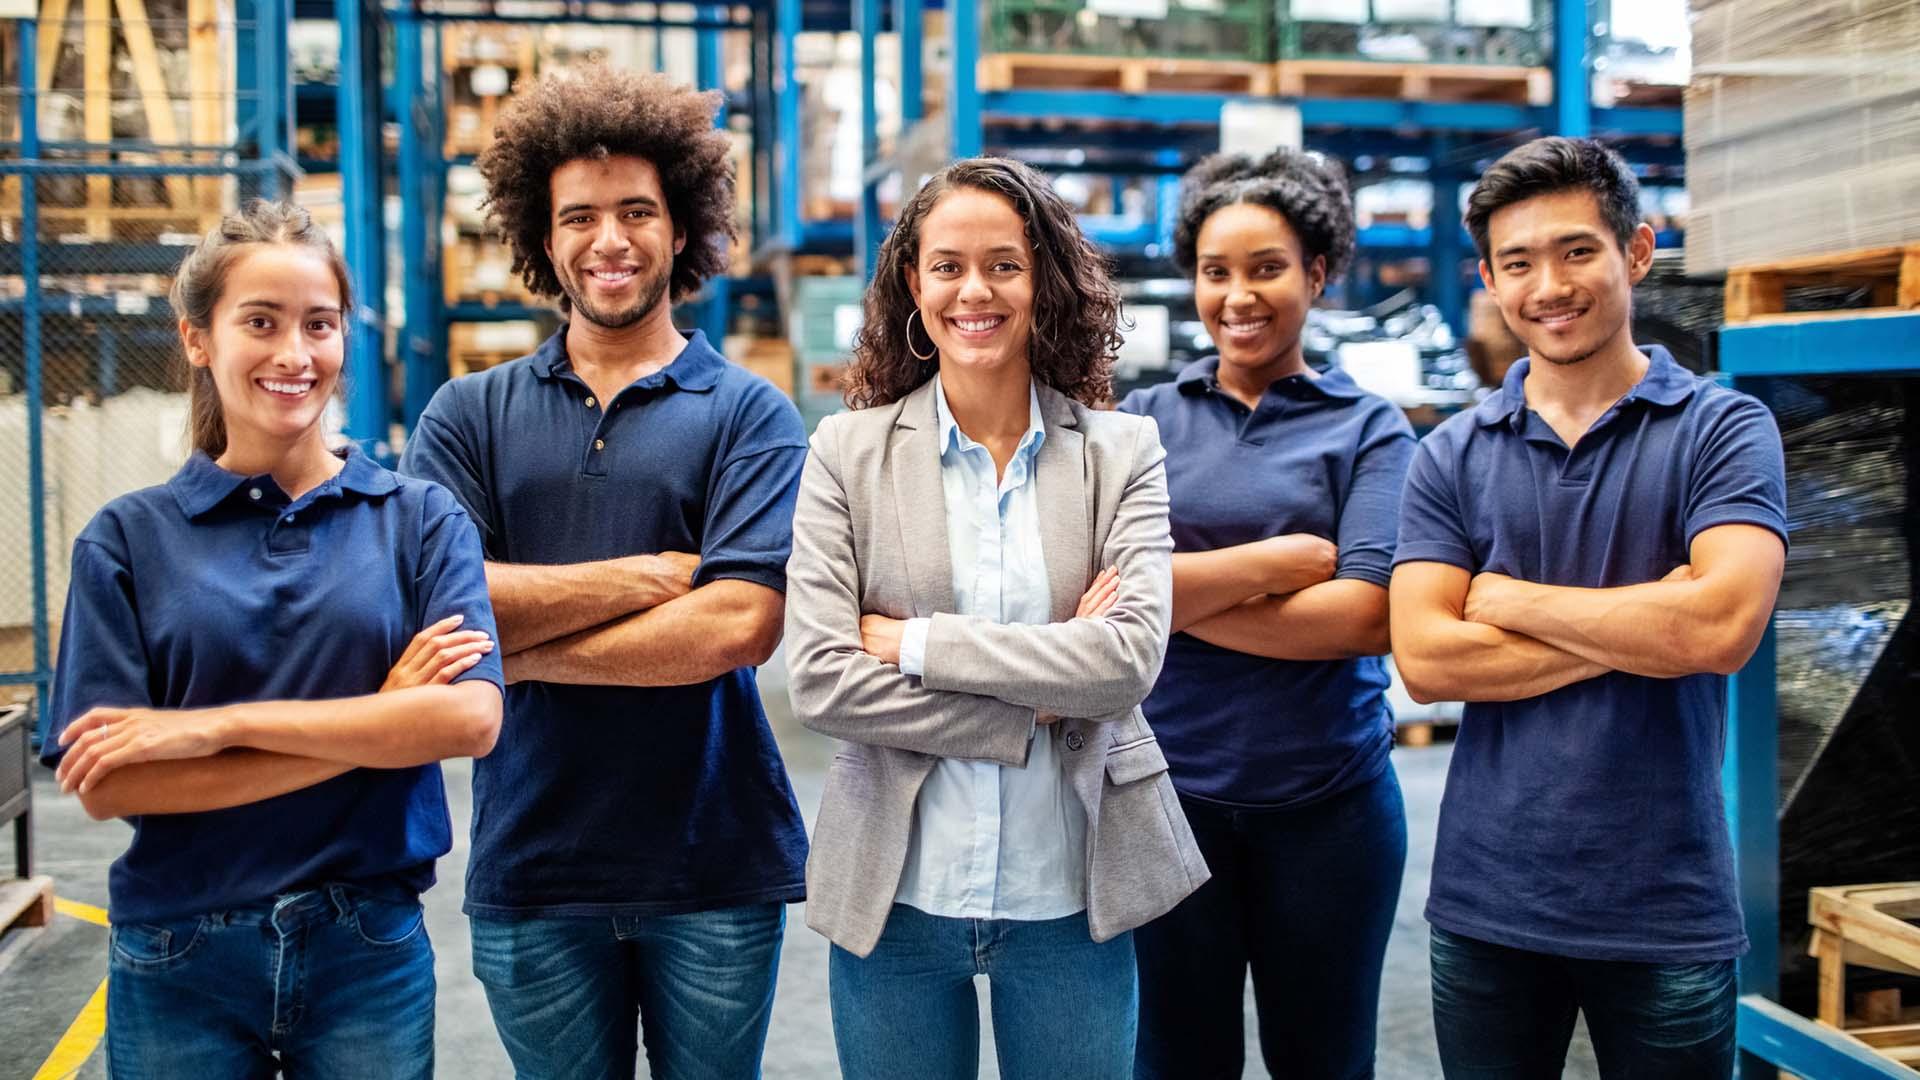 Diverse workforce standing together